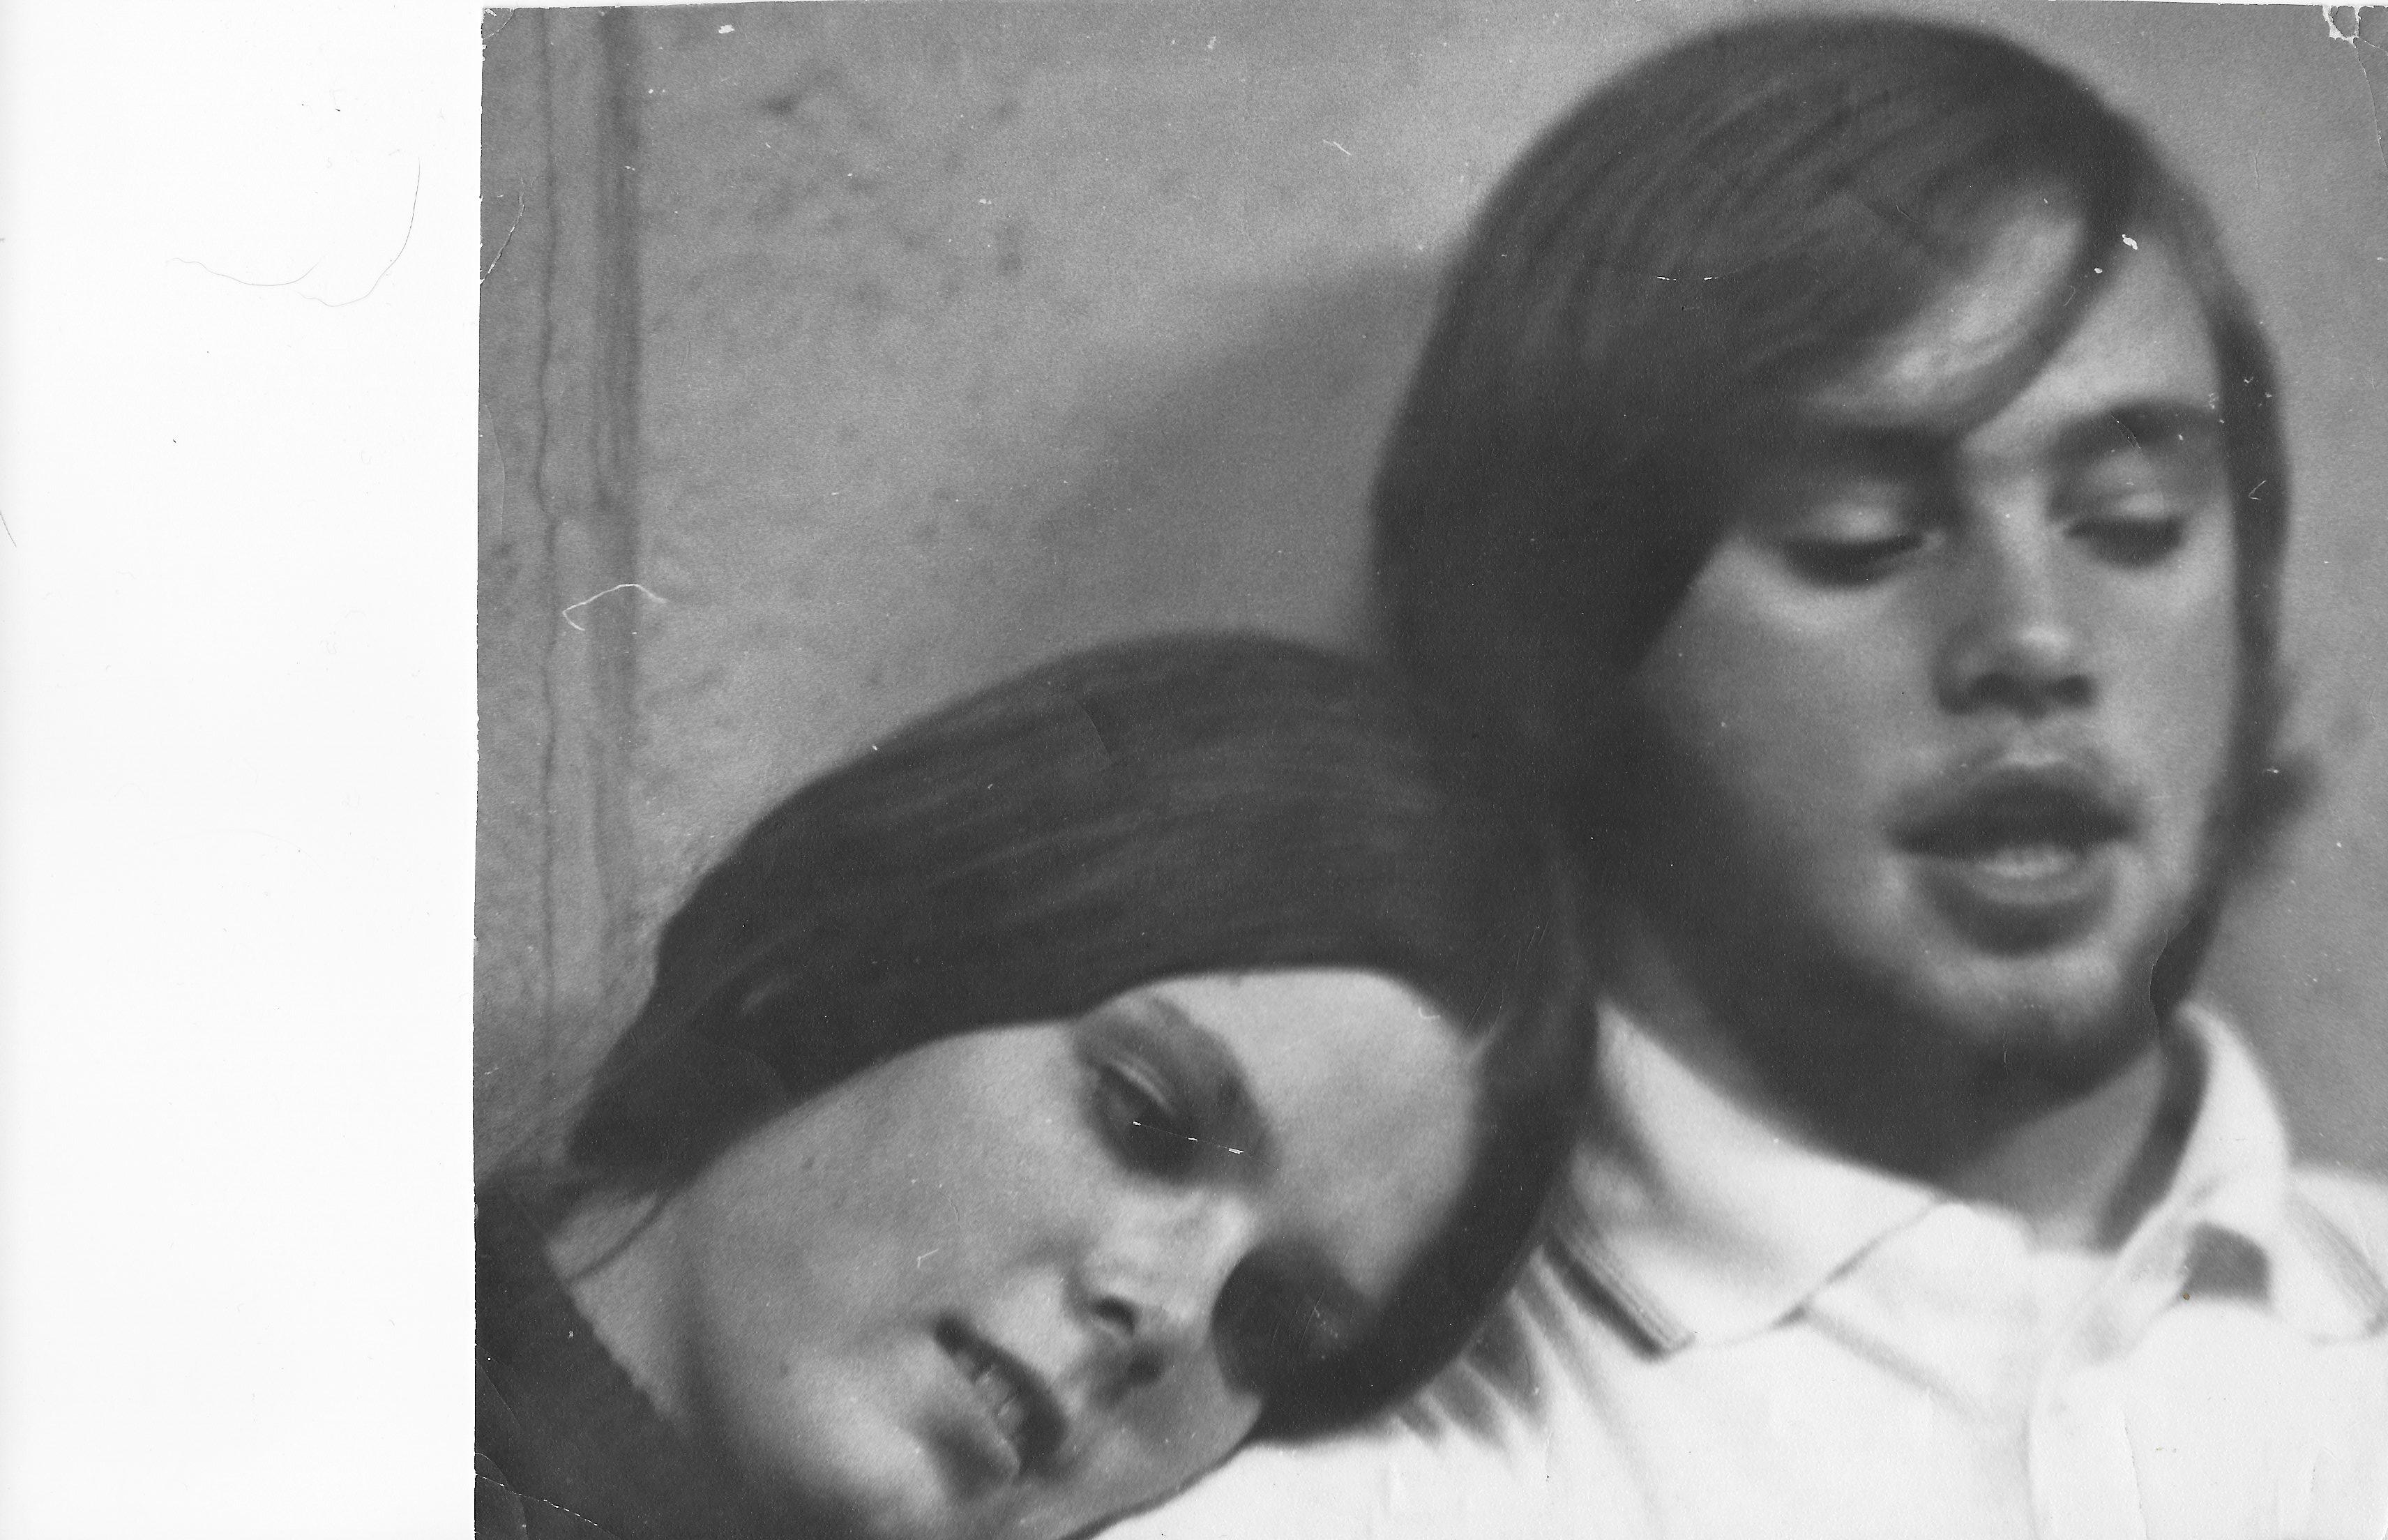 Grant & Chris, 1970